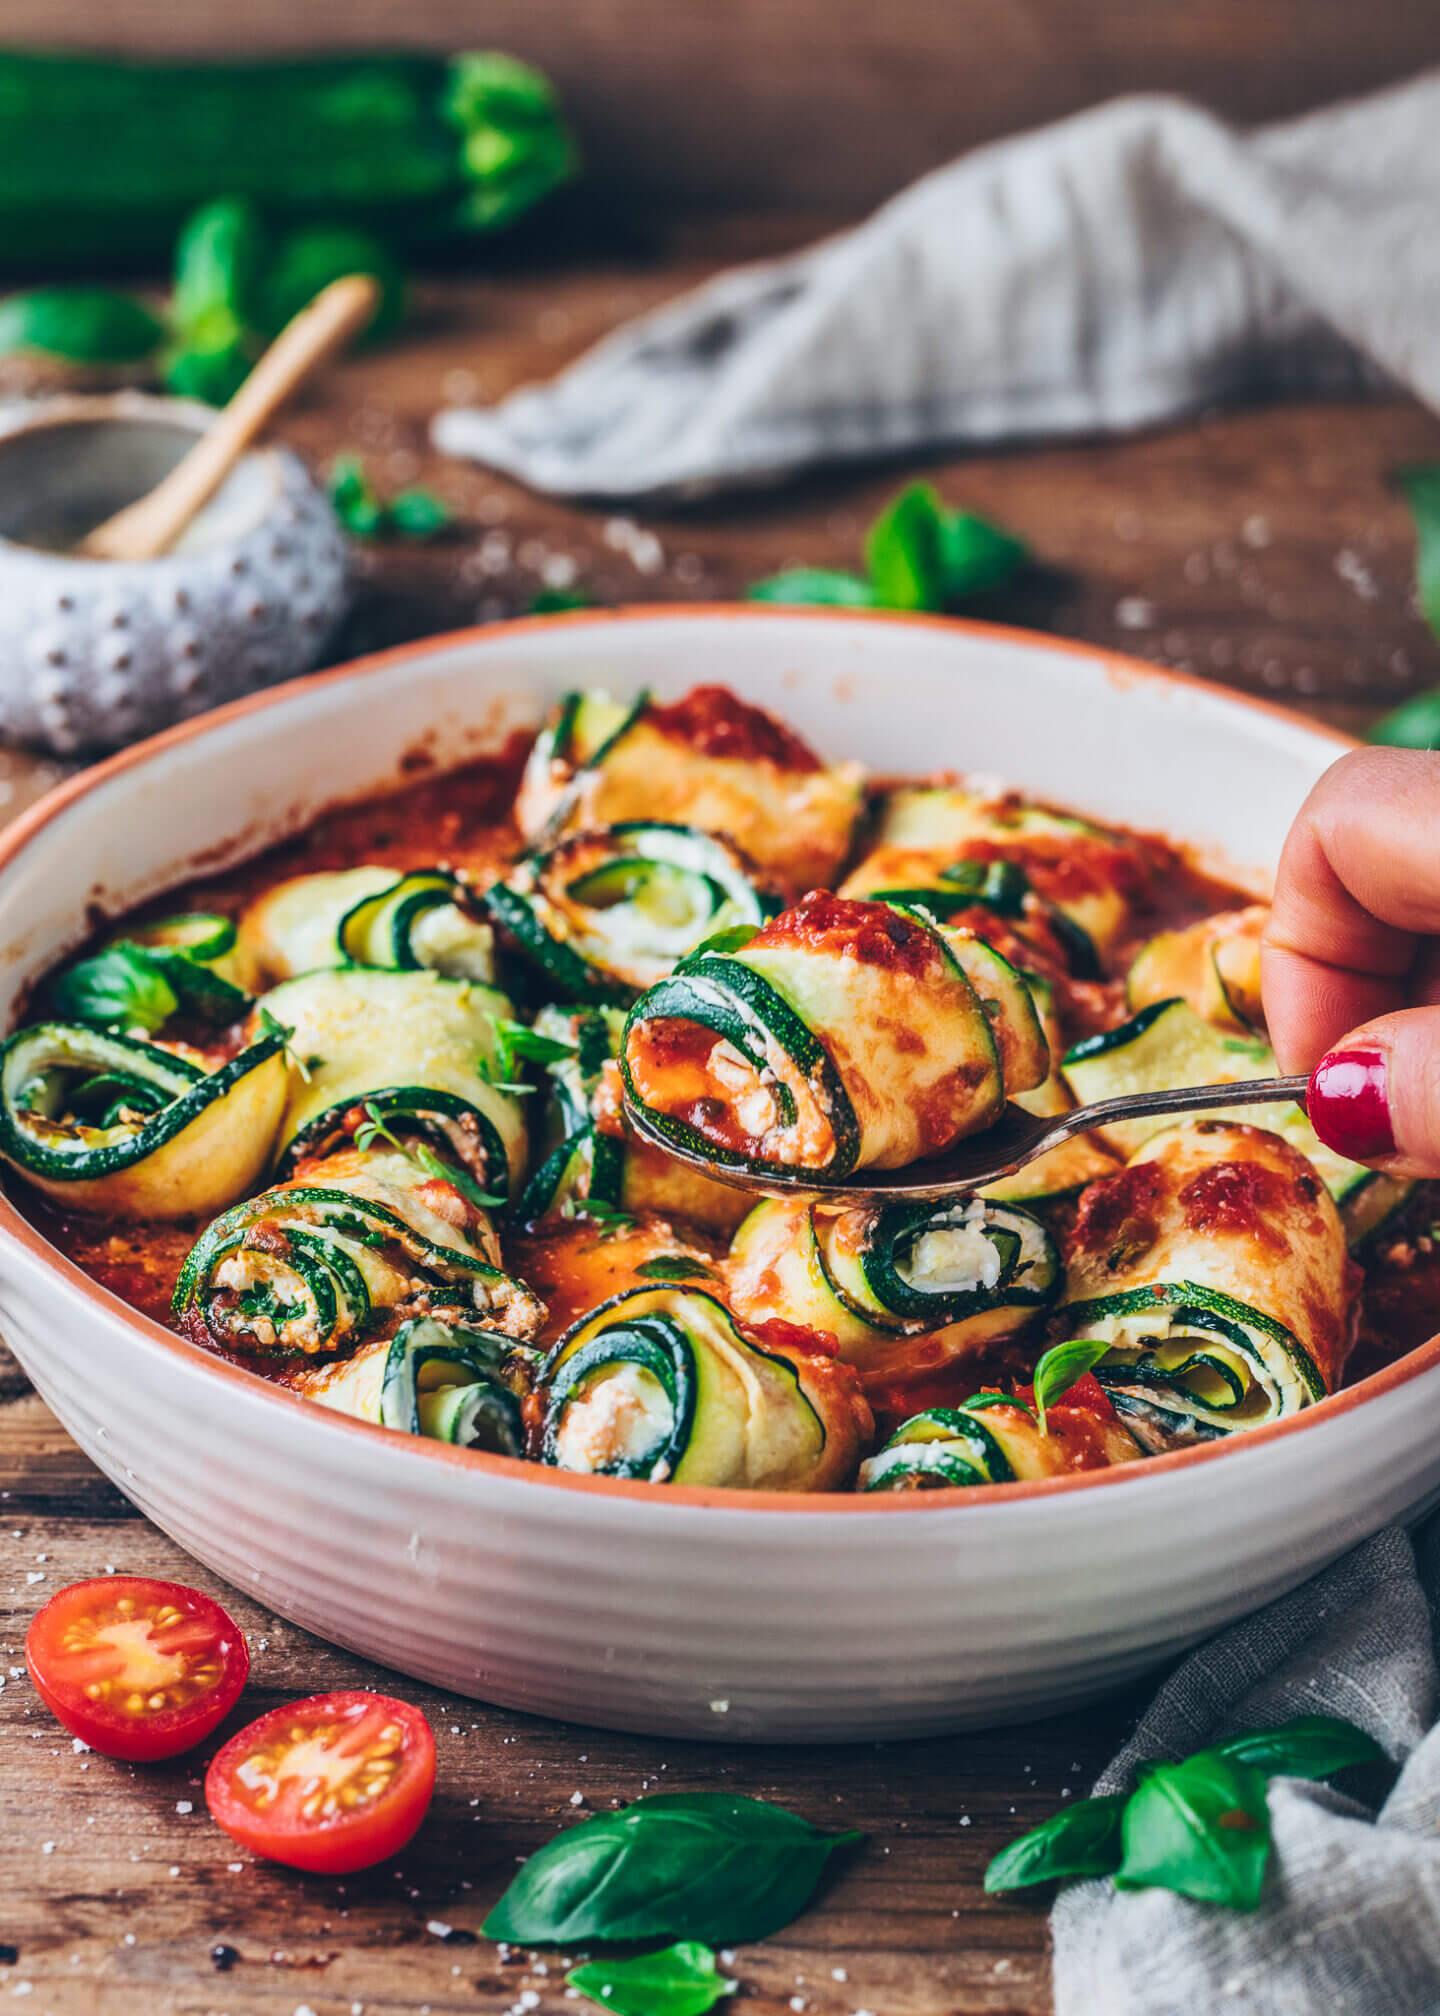 Zucchini-Röllchen mit Cashew-Ricotta